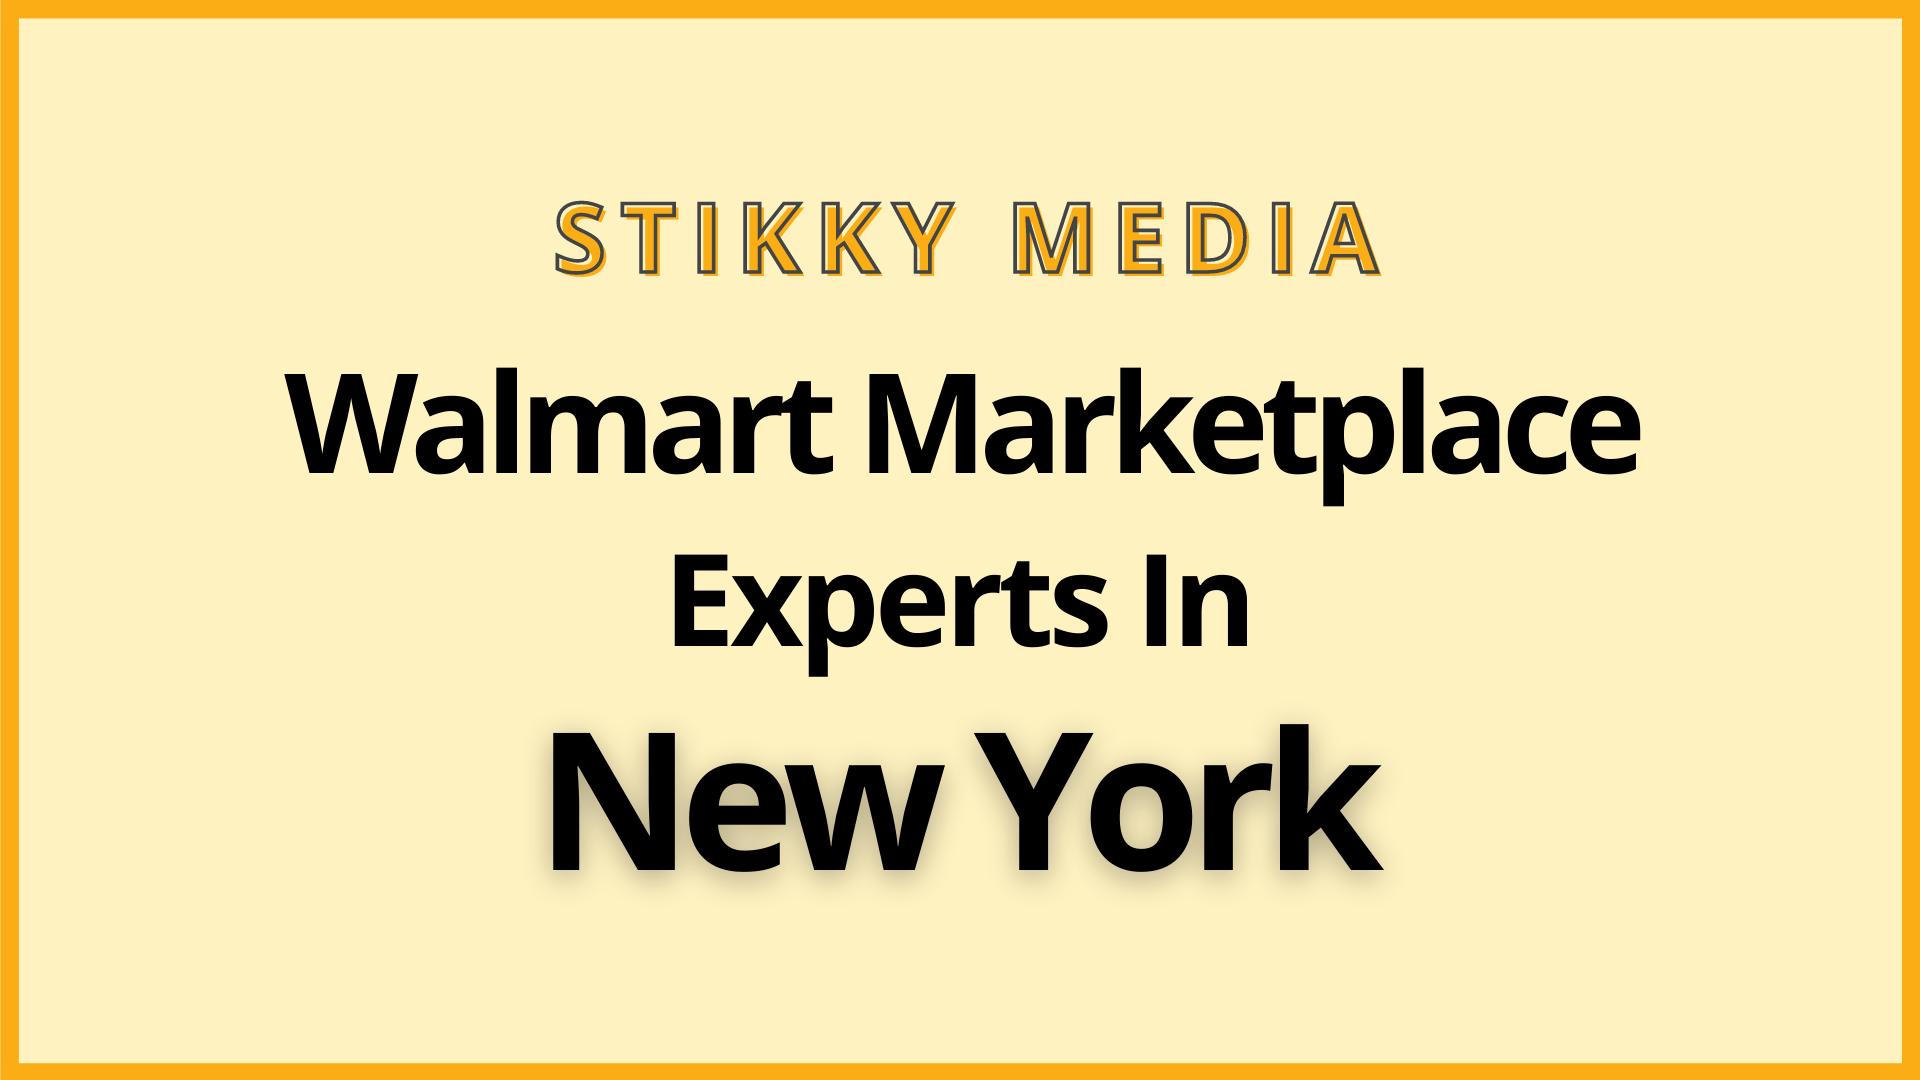 Walmart marketplace account set up New York - Stikky Media